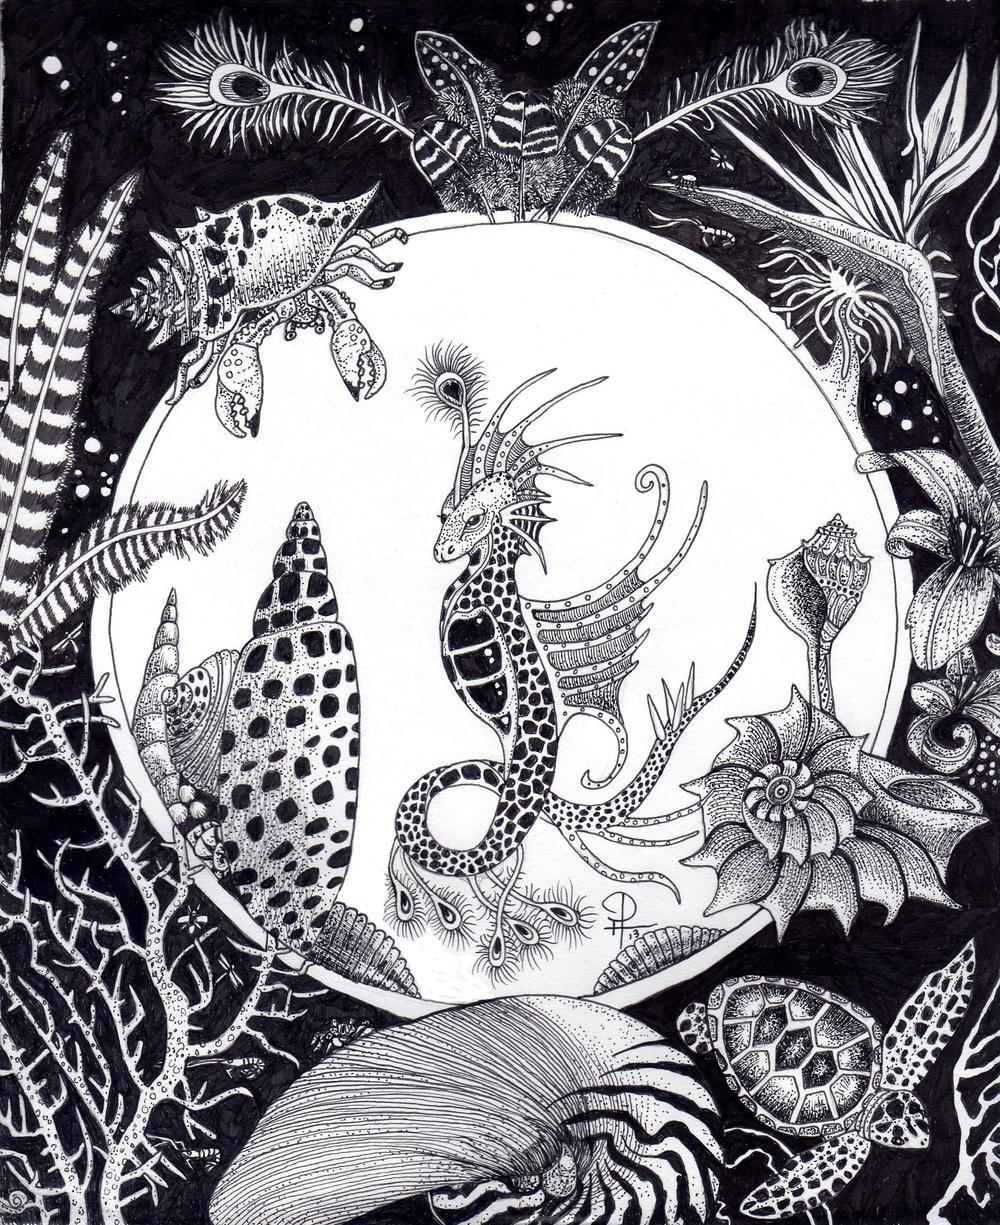 DougHiser_seahorsefantasy_12x16_ink.jpg